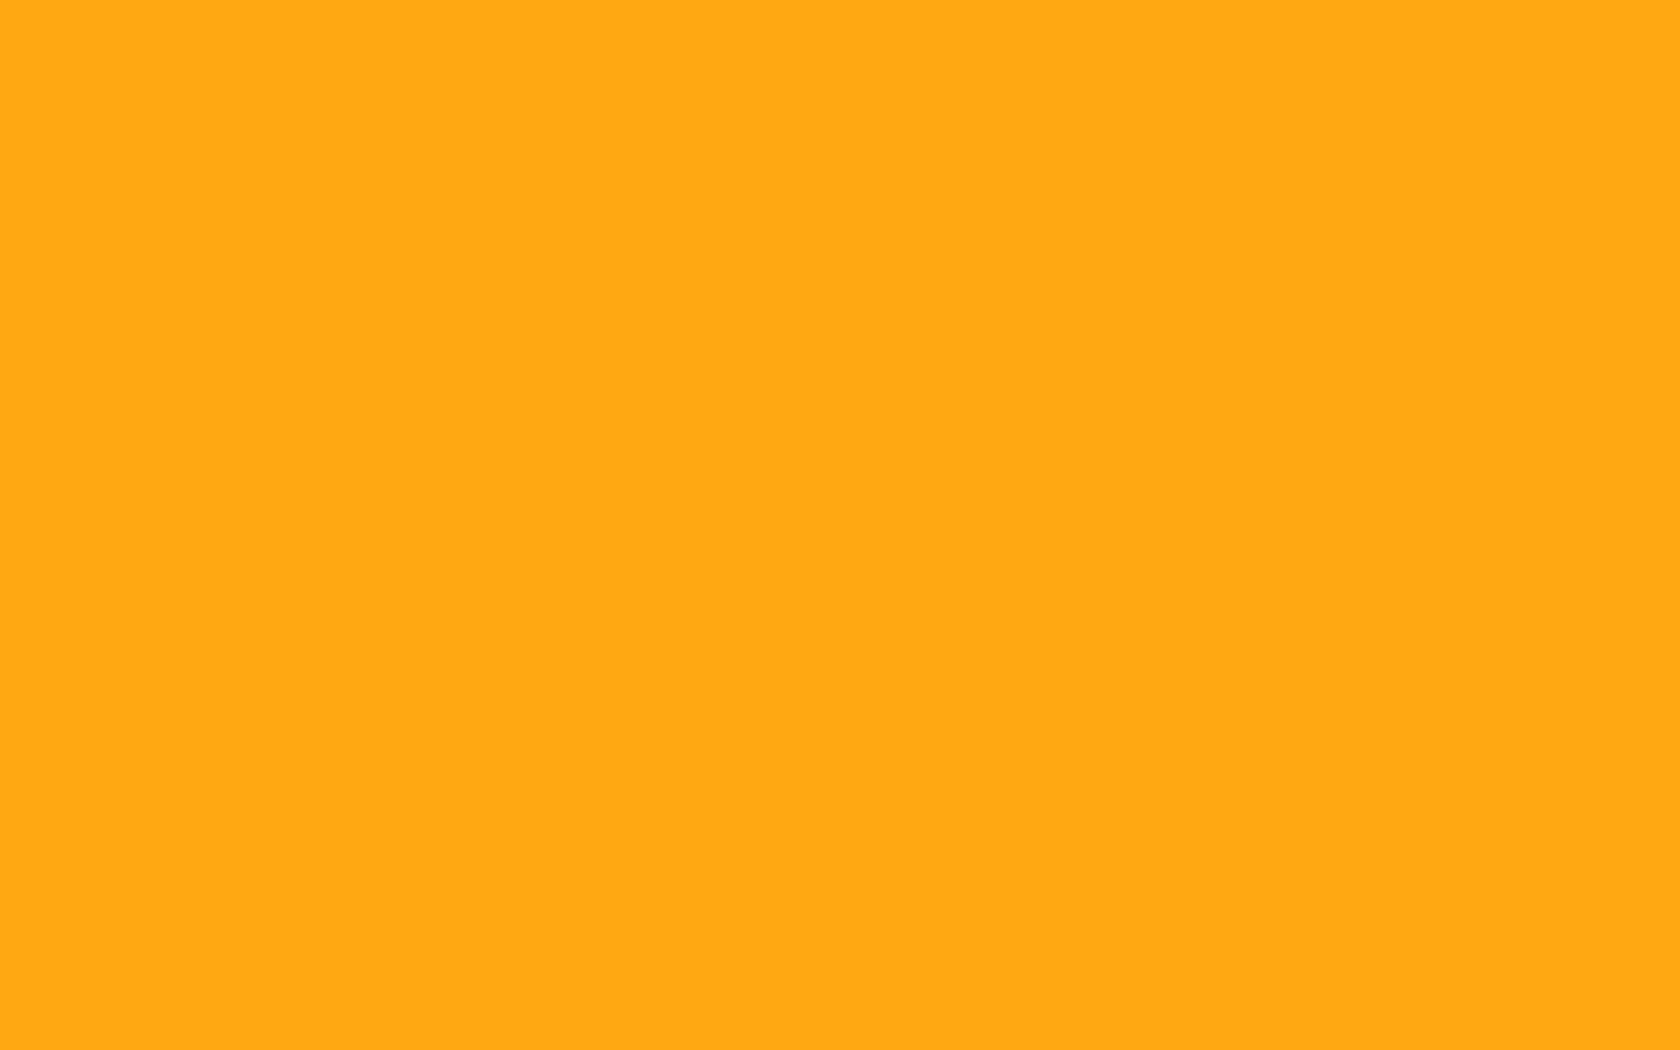 1680x1050 Dark Tangerine Solid Color Background